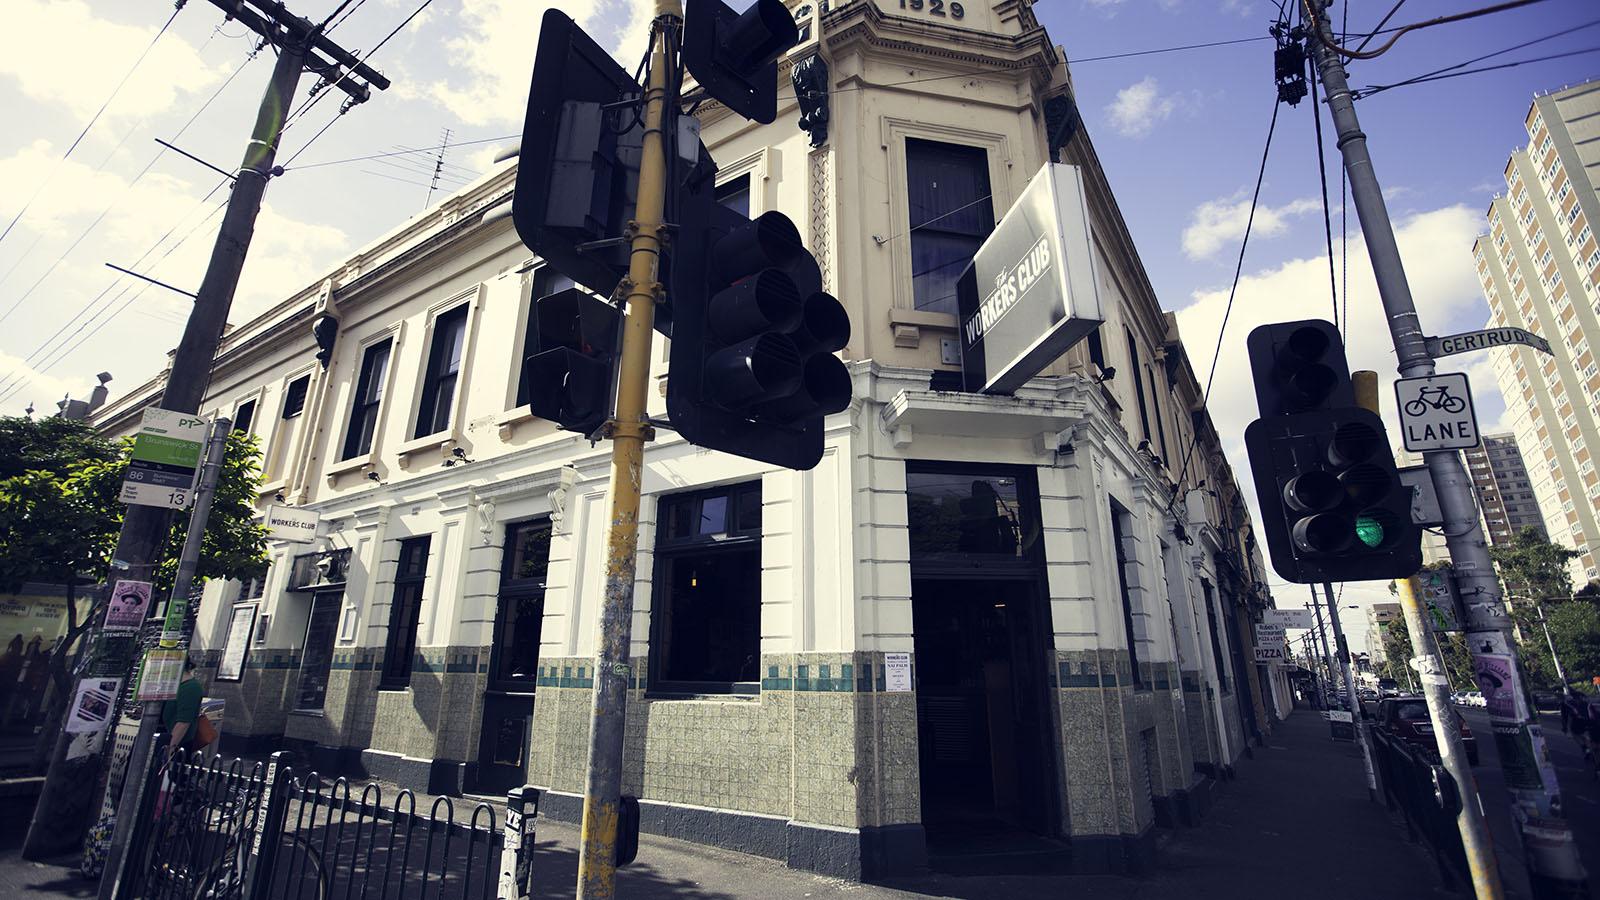 The Workers Club, Melbourne, Victoria, Australia